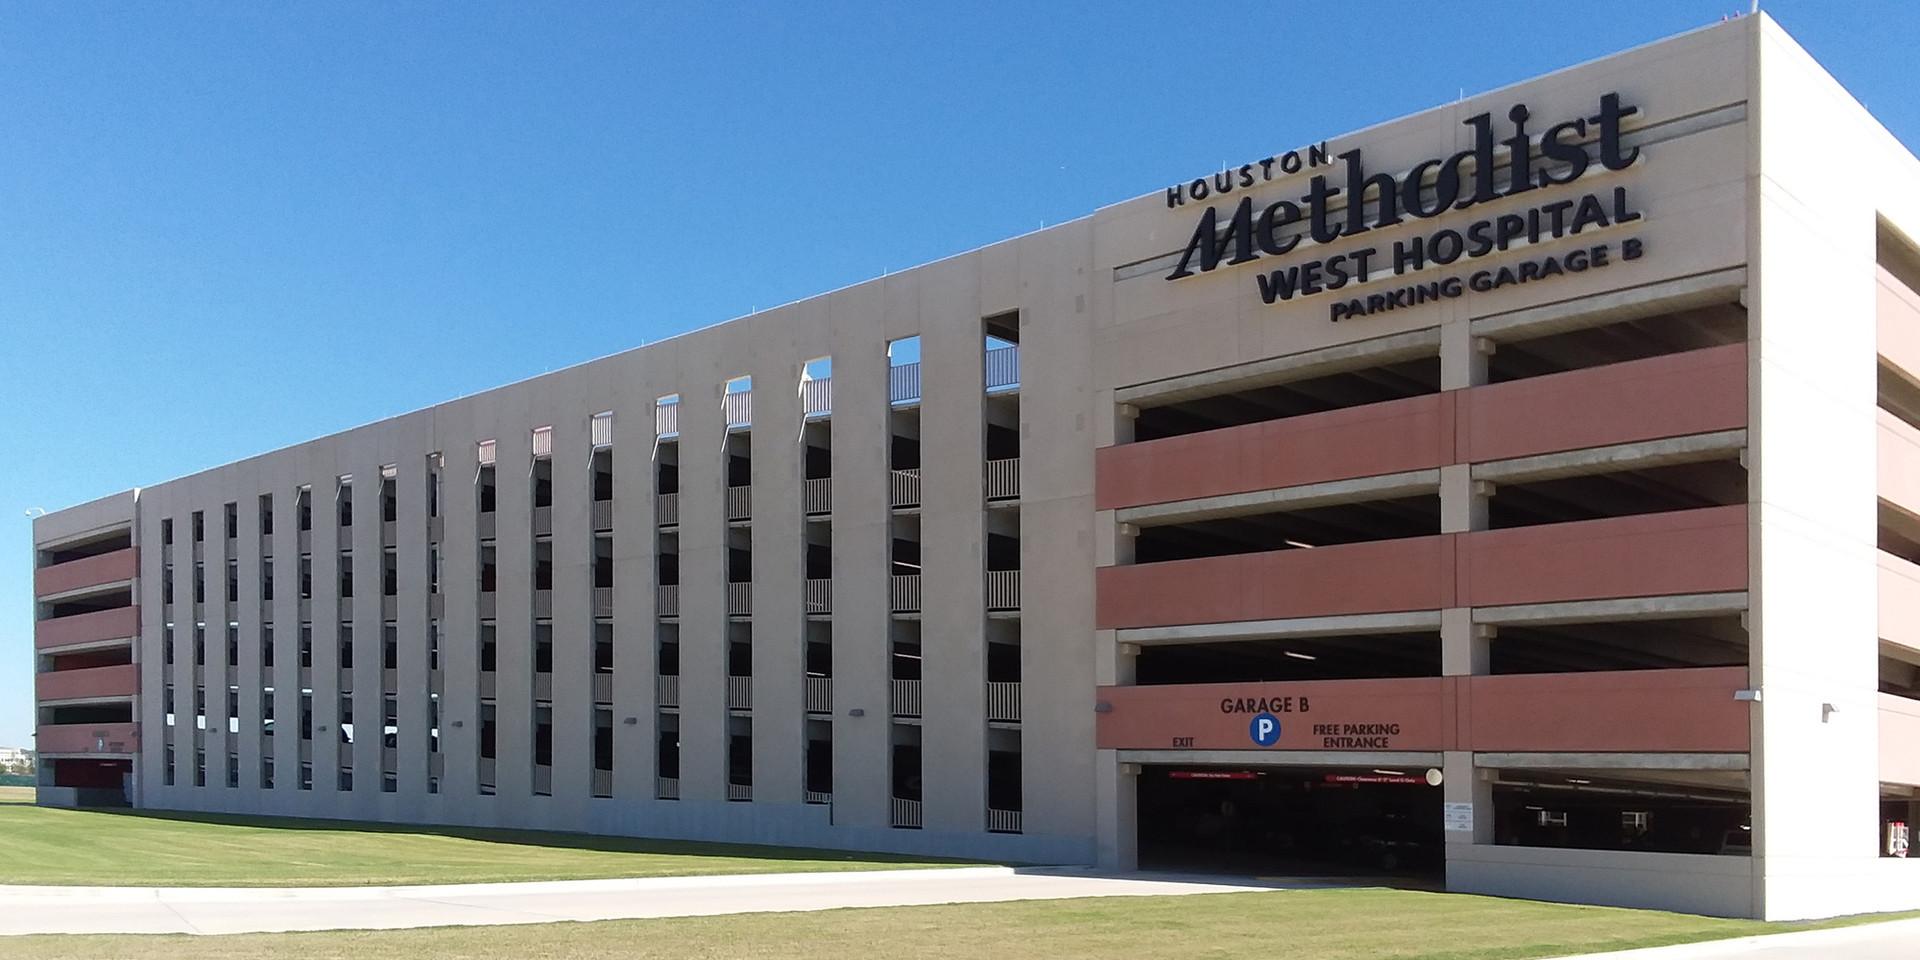 Houston Methodist Hospital Parking Garage